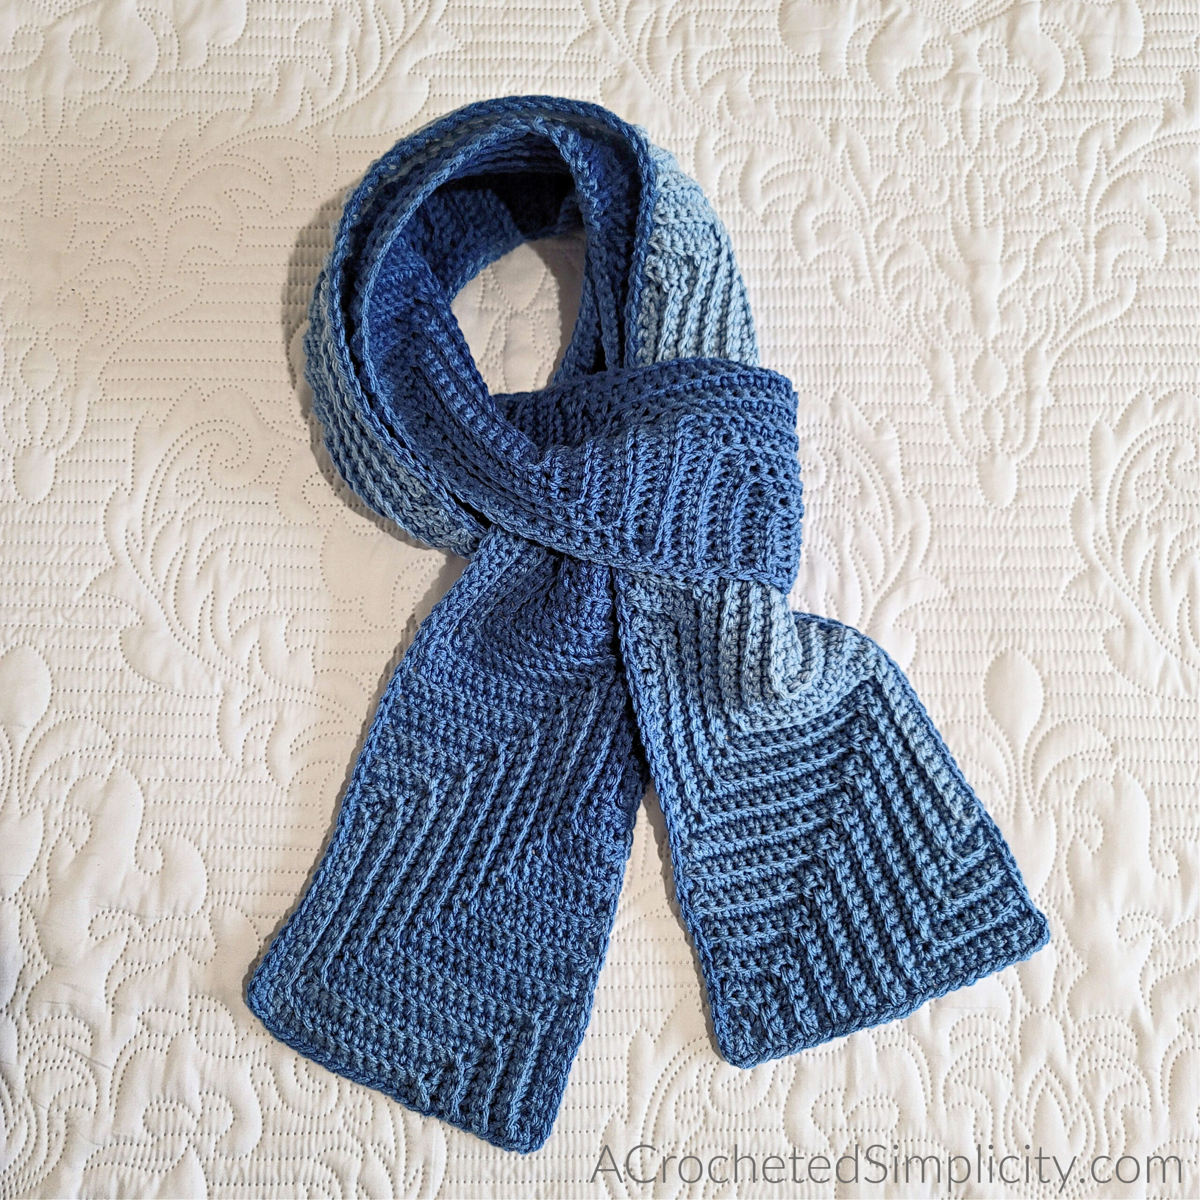 Free Crochet Scarf Pattern - Diagonal Ripple Scarf by A Crocheted Simplicity #freecrochetpattern #crochetscarf #freecrochetscarfpattern #crochetscarfpattern #ripplepattern #crochetripplepattern #crochetripple #handmade